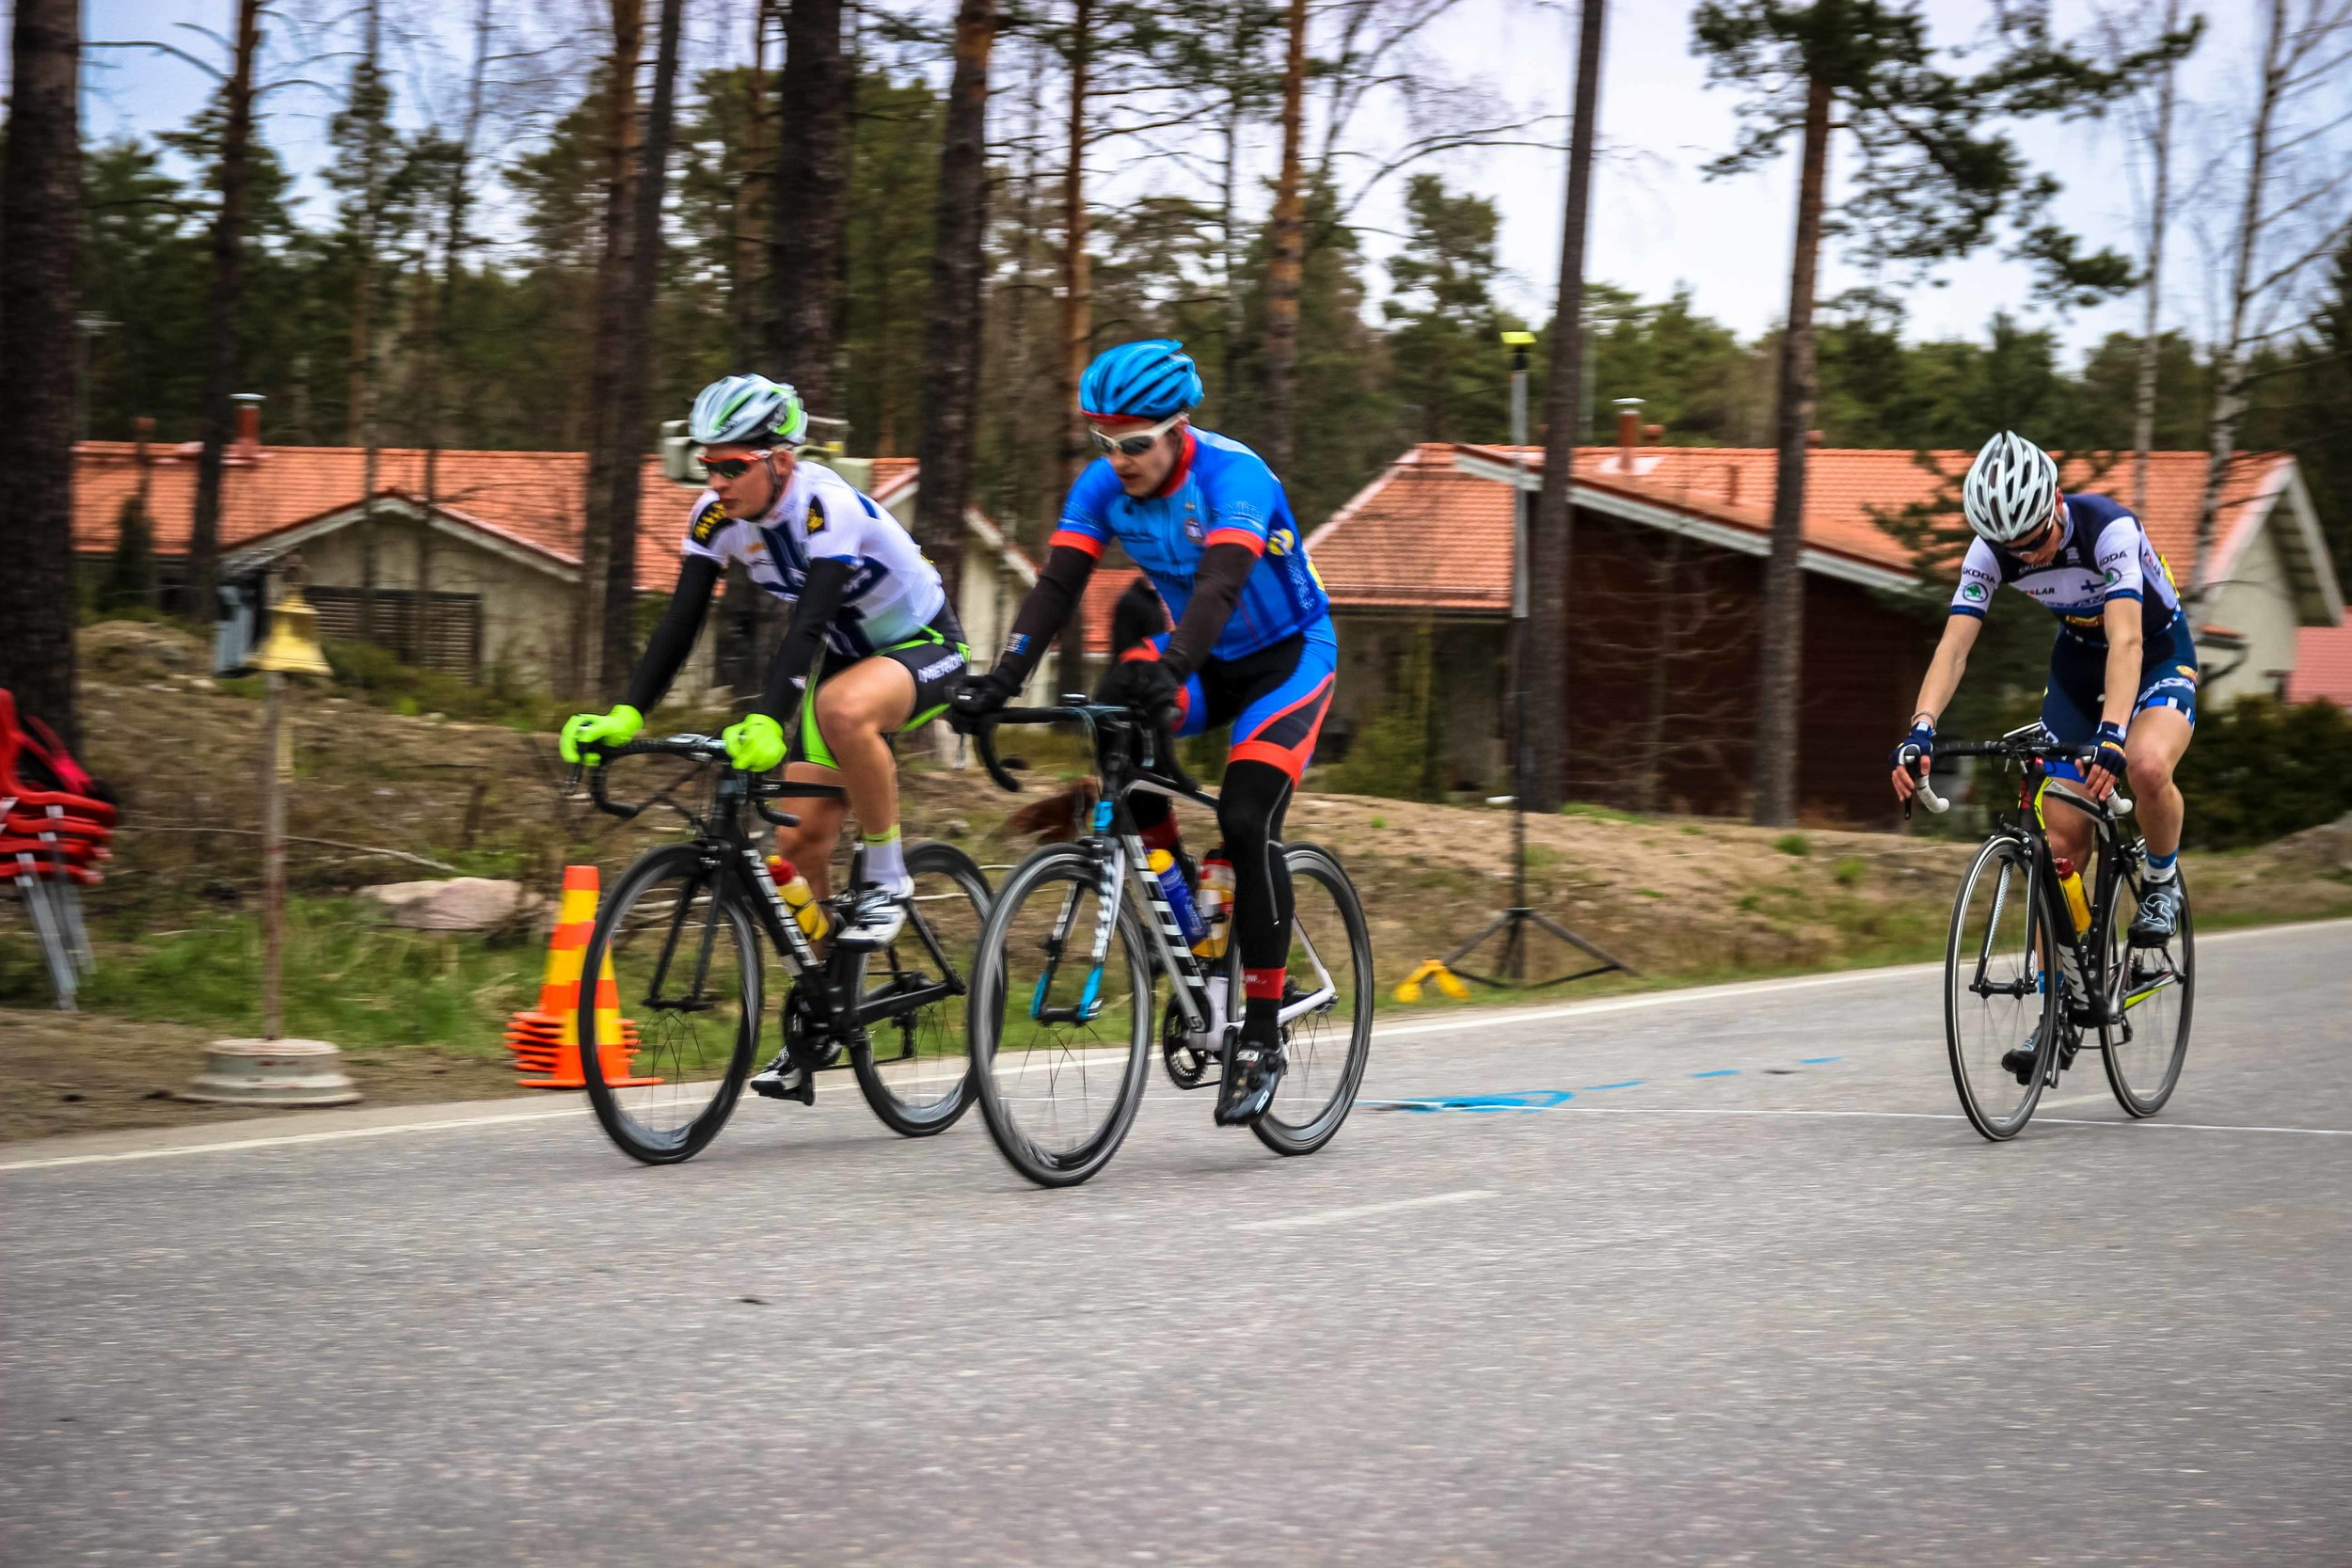 Jaakko Hänninenhaving barely avoided the crash before the finish crossing the finish line